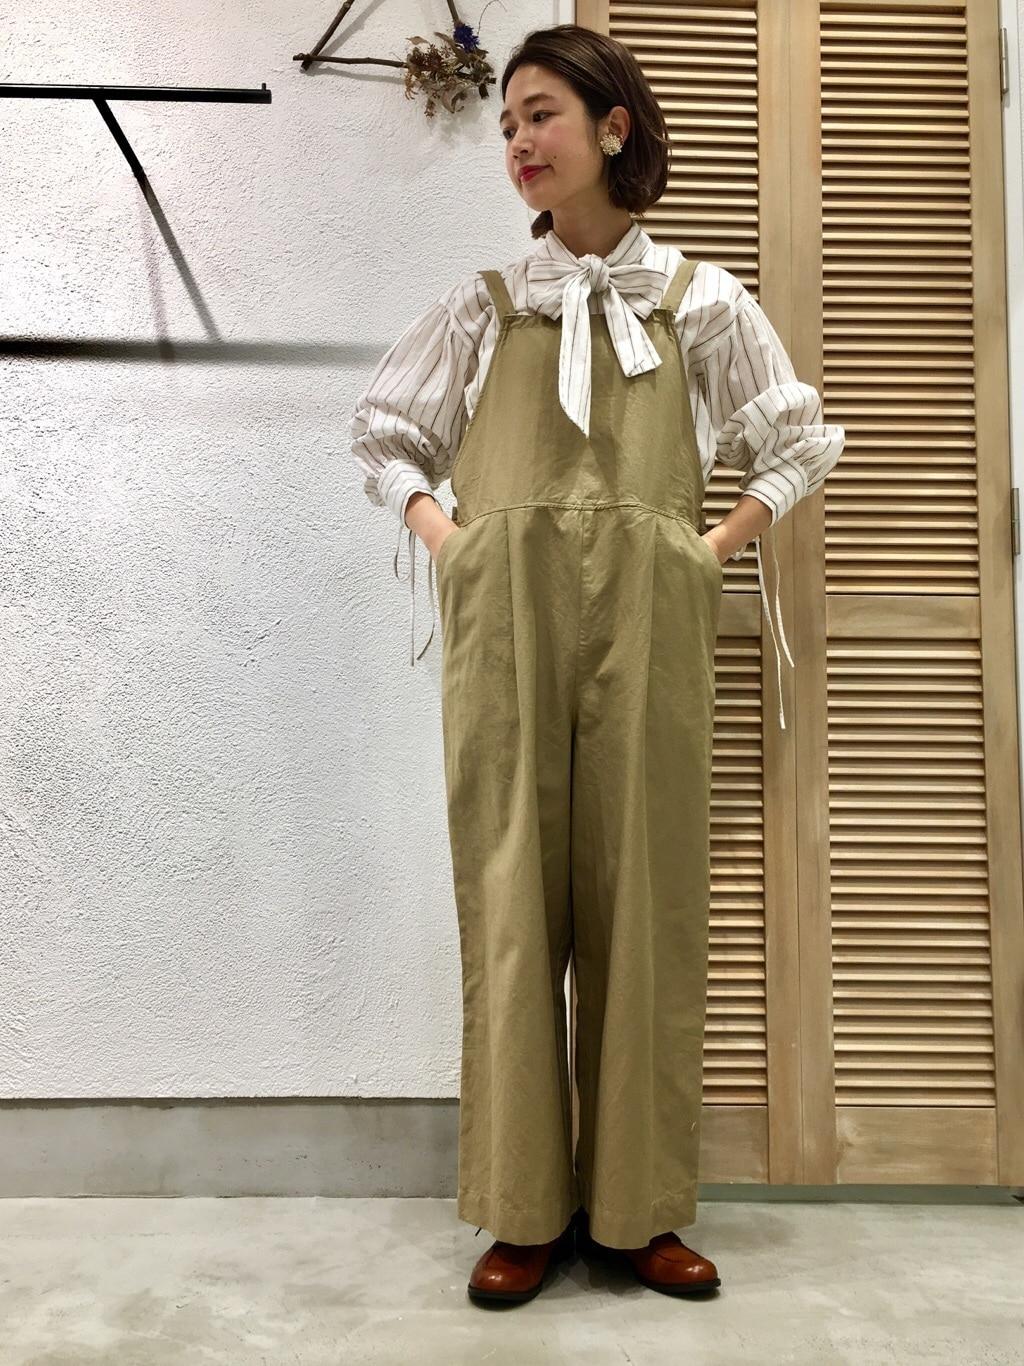 chambre de charme 横浜ジョイナス 身長:160cm 2021.01.27